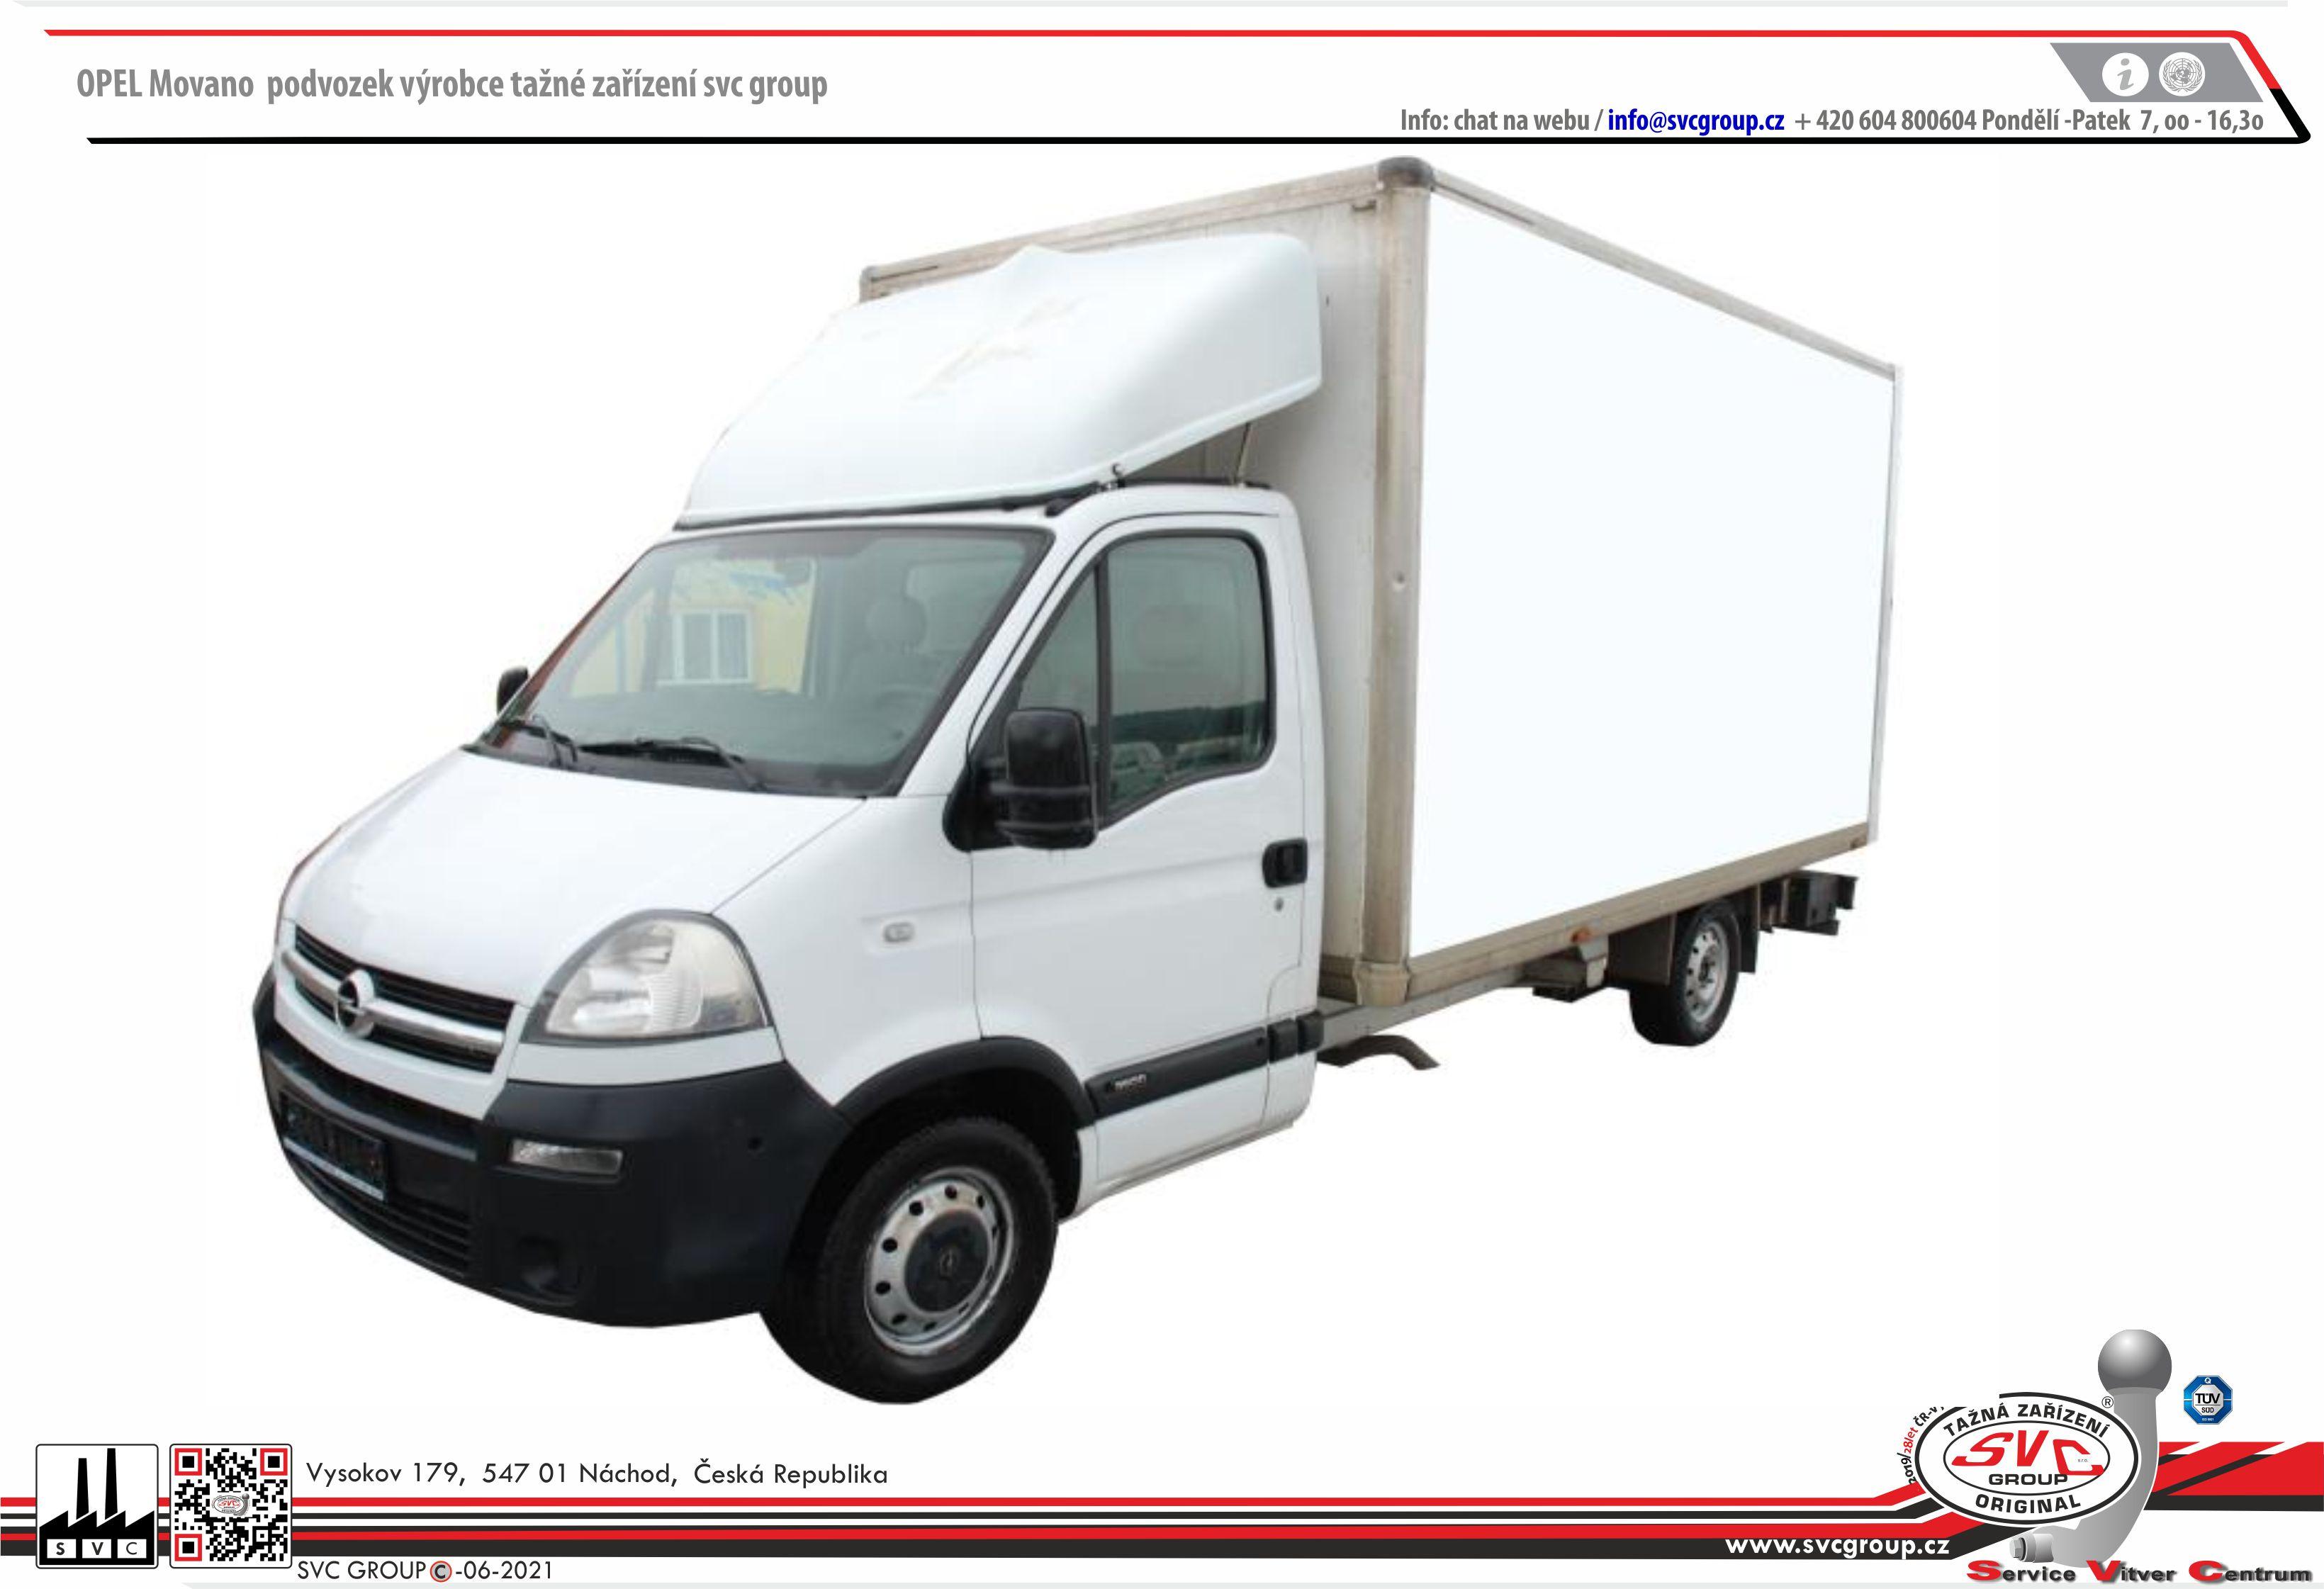 Opel Movano Valník/Podvozek